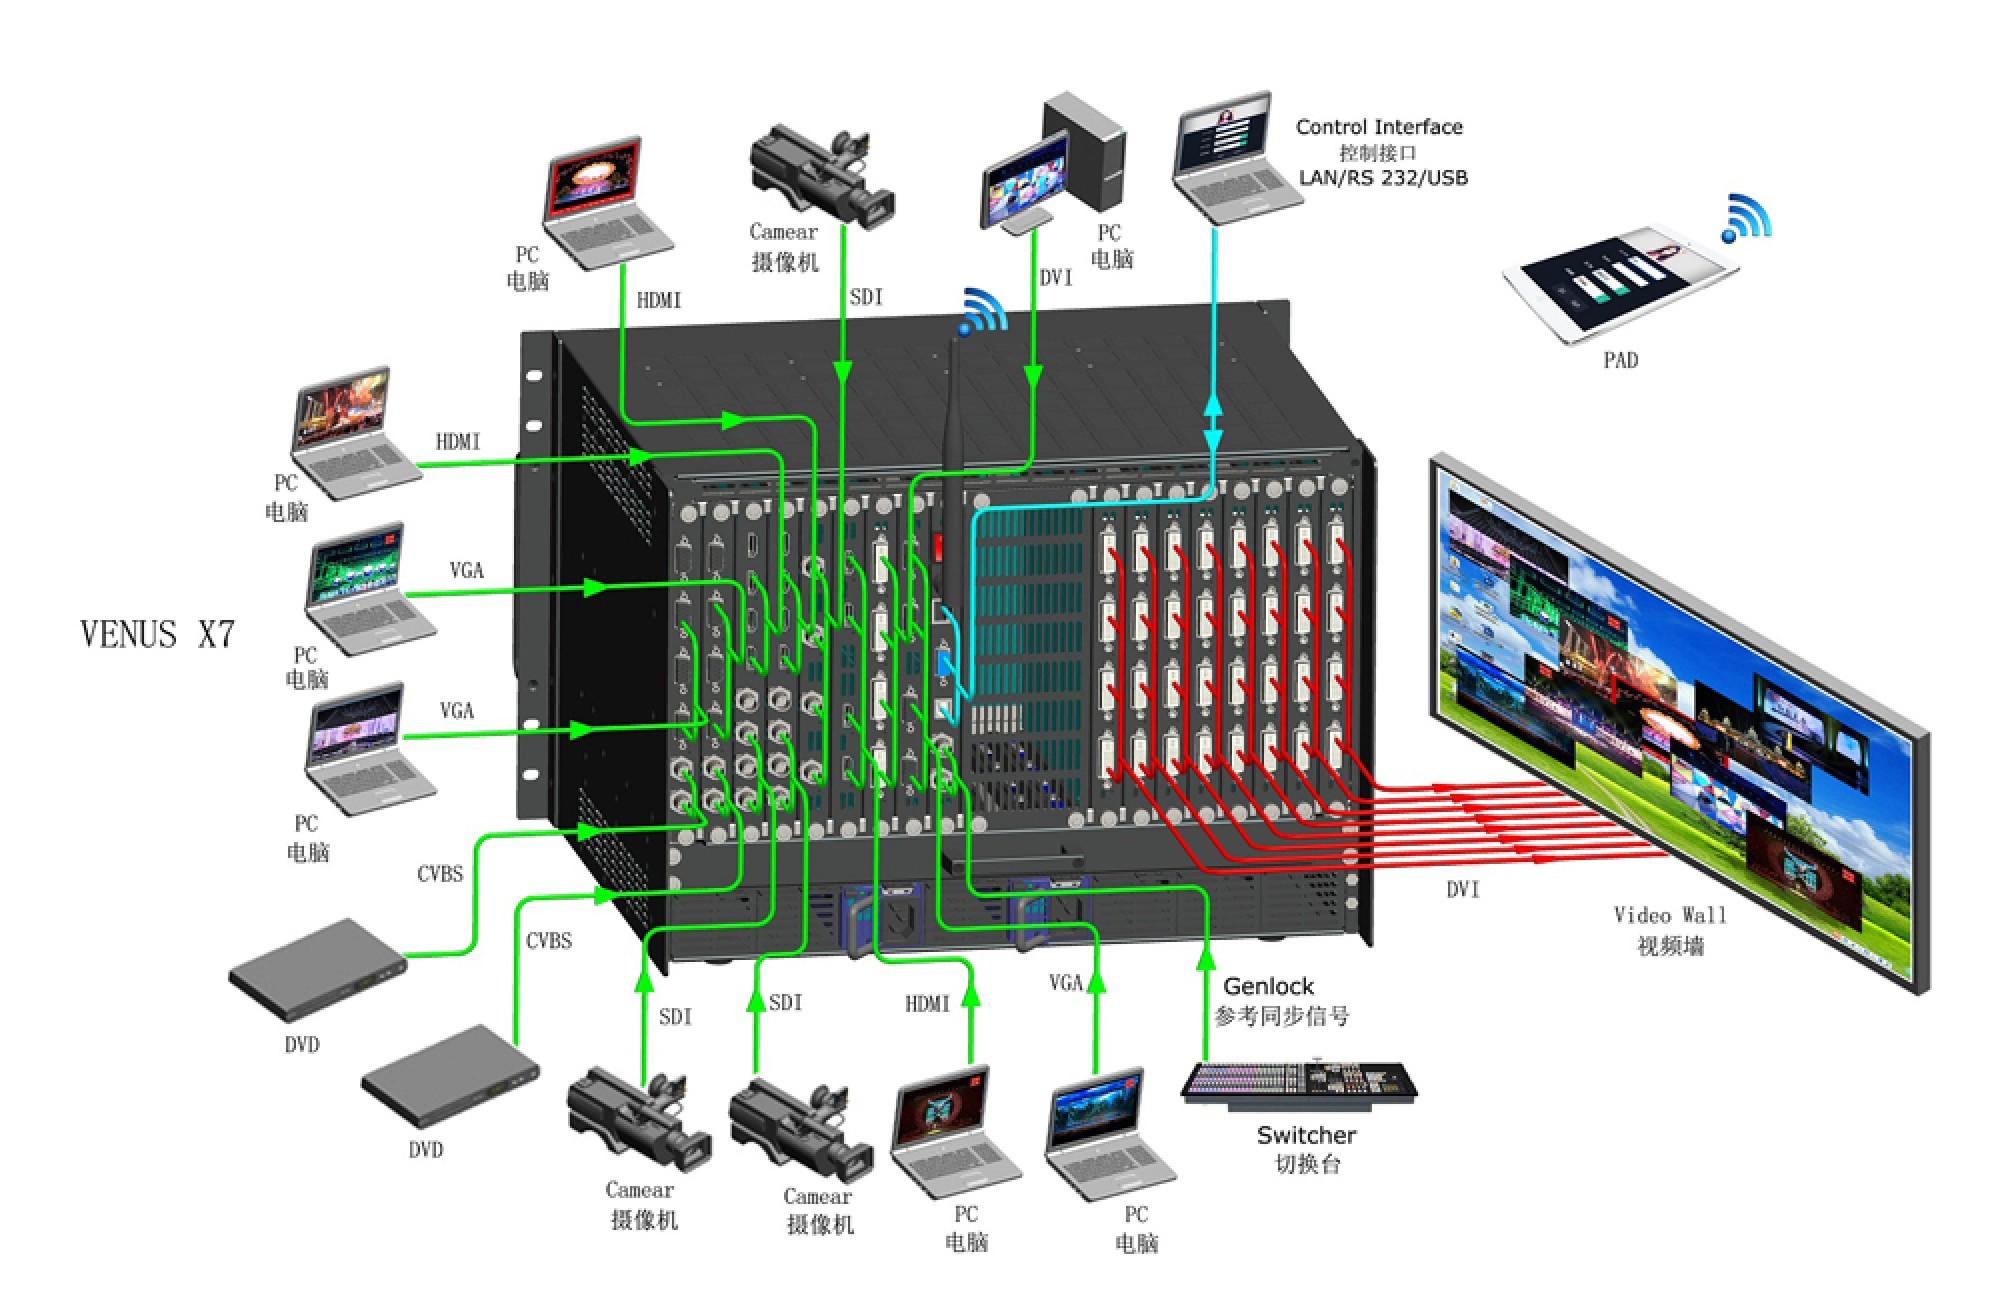 RGBLink VENUS X7 Splicing LED Video Processor